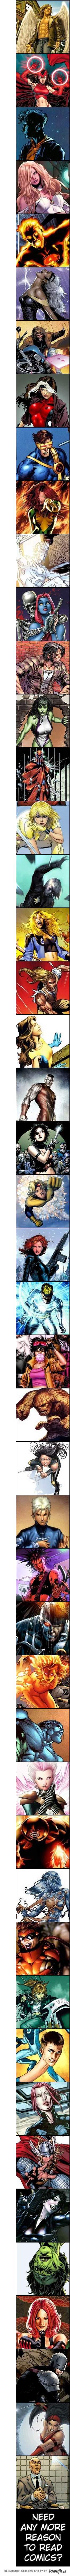 need any more reason to read comics?